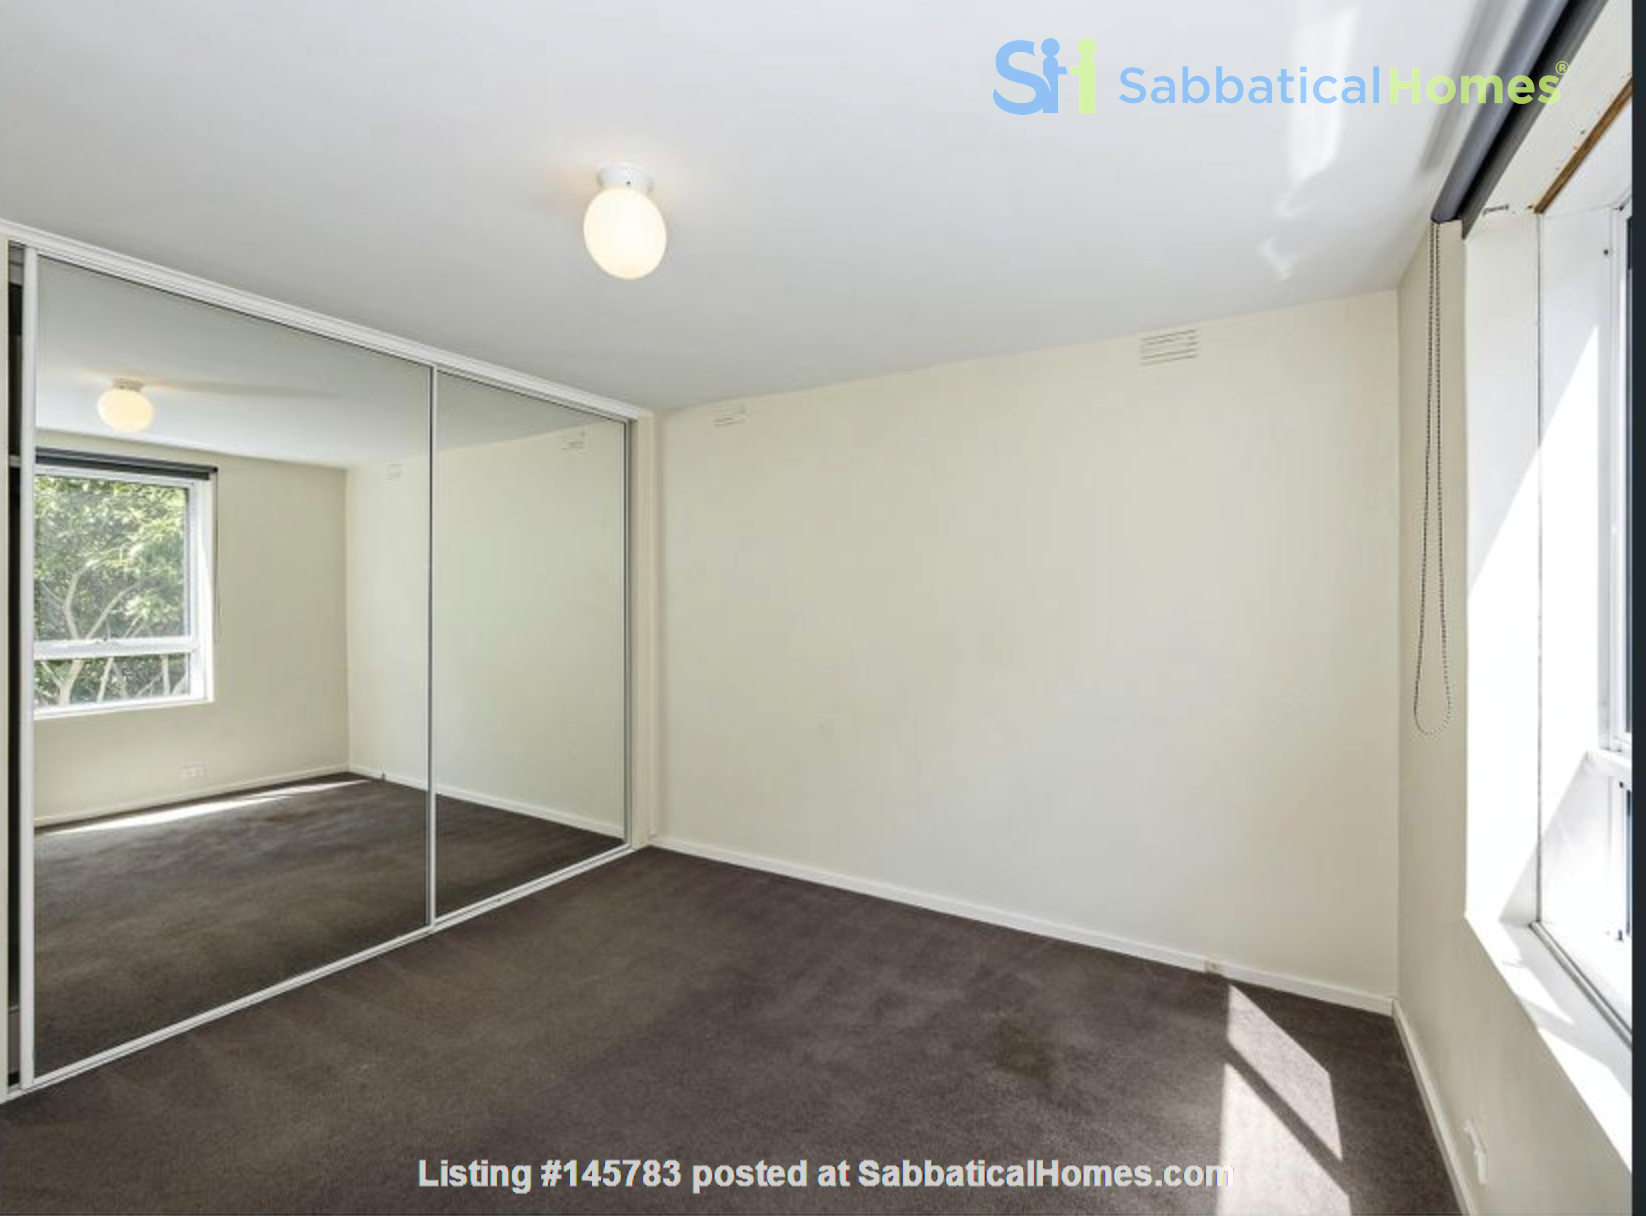 2 bedroom apartment in inner city Melbourne Home Rental in St Kilda East 2